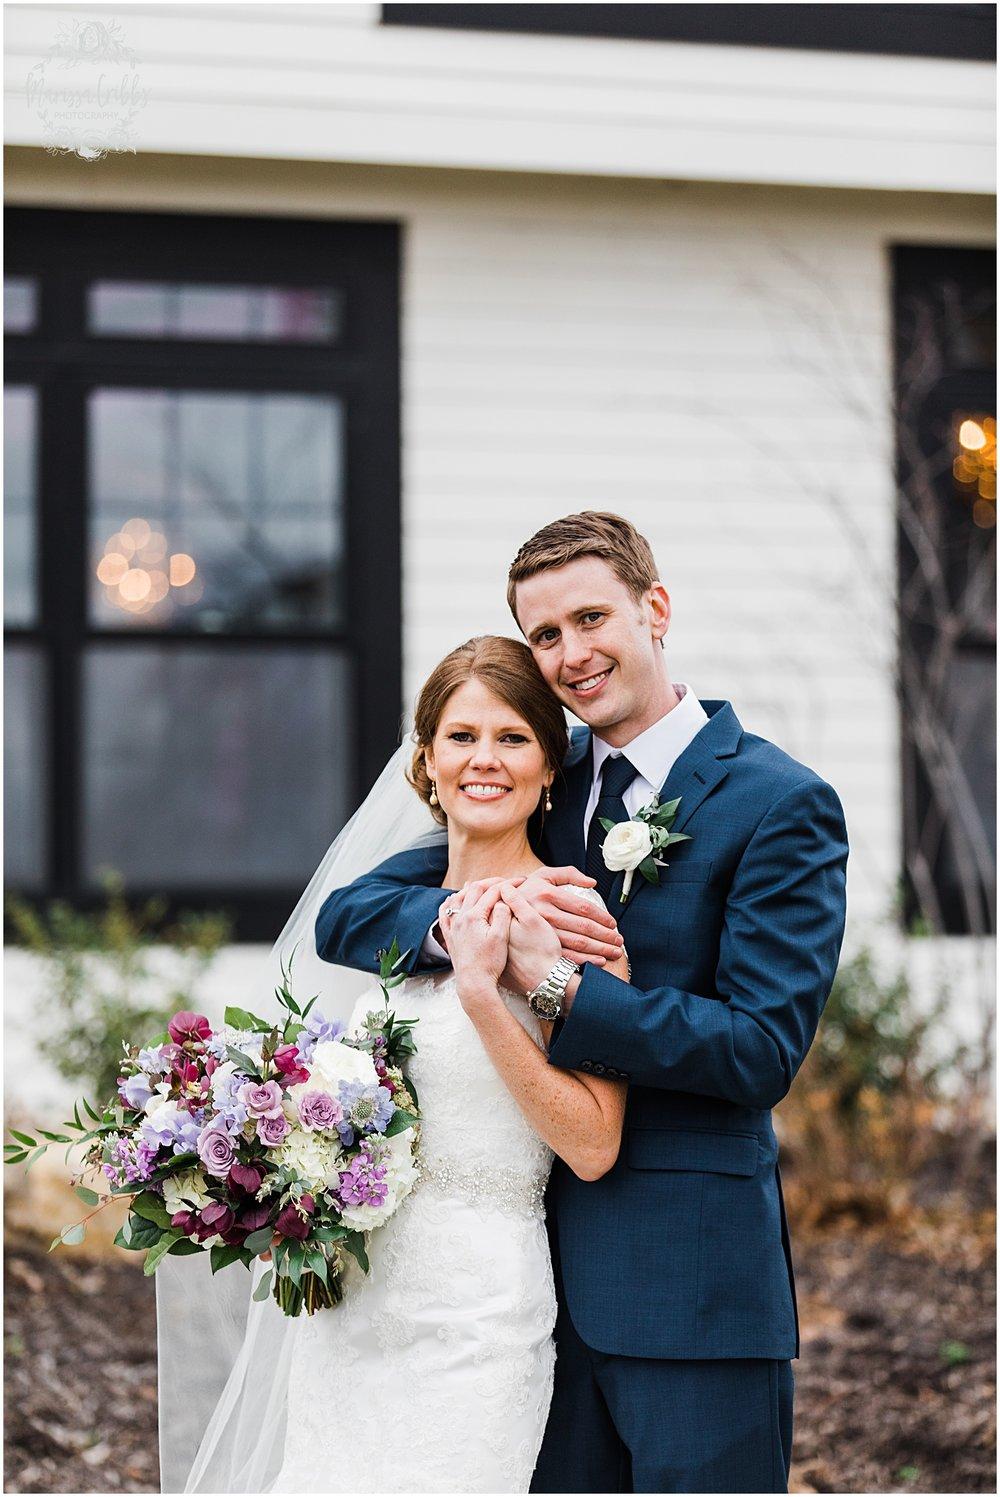 JACOBI WEDDING | 1890 EVENT SPACE | MARISSA CRIBBS PHOTOGRAPHY_4330.jpg